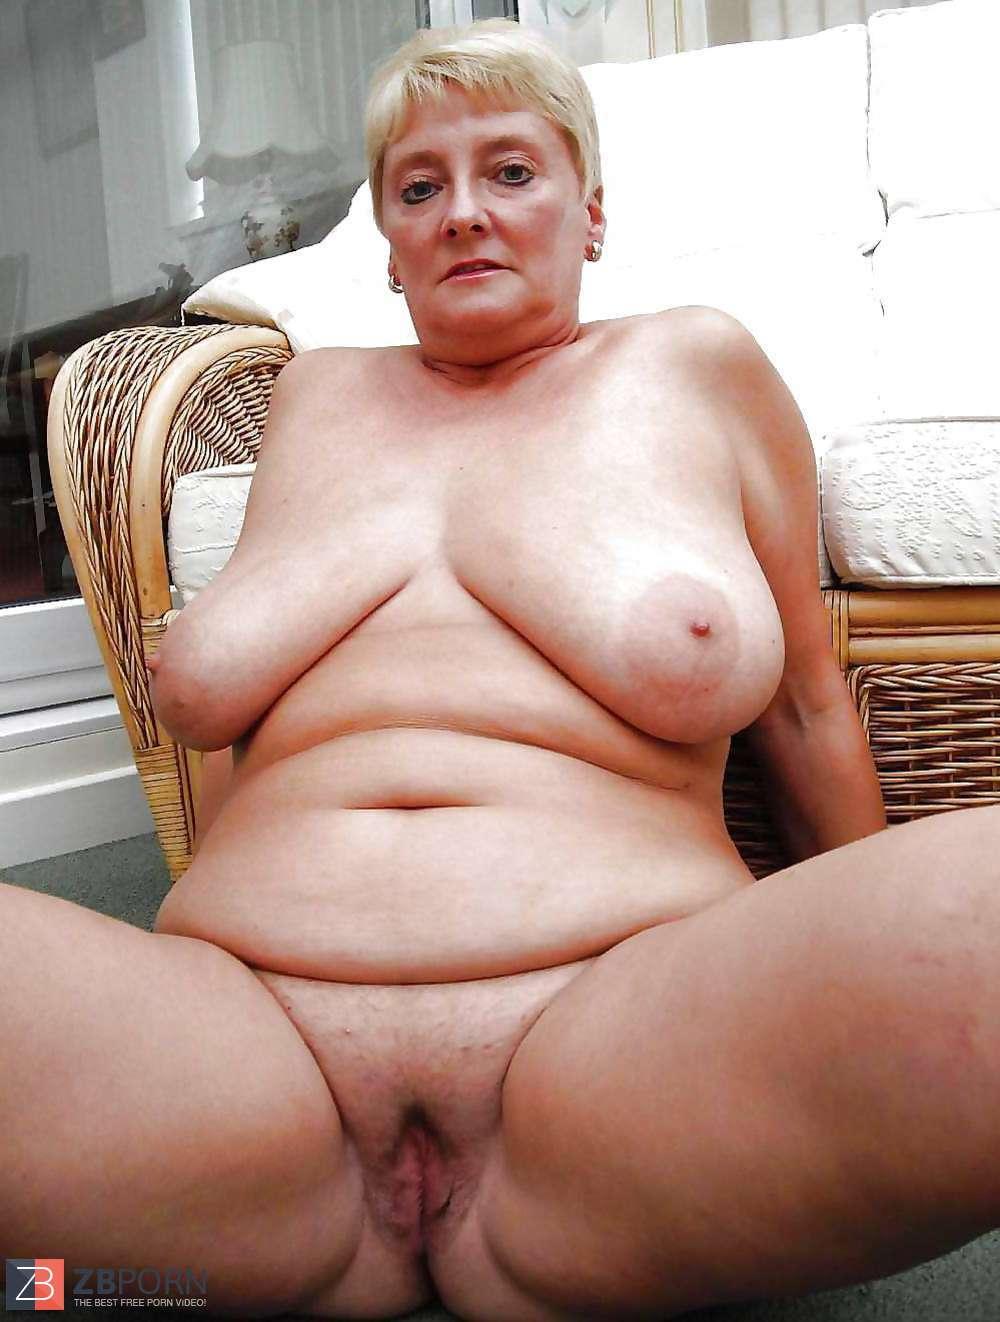 All Granny Porn allgrannyporn - #4 tastey granny pussys and giant jugs / zb porn